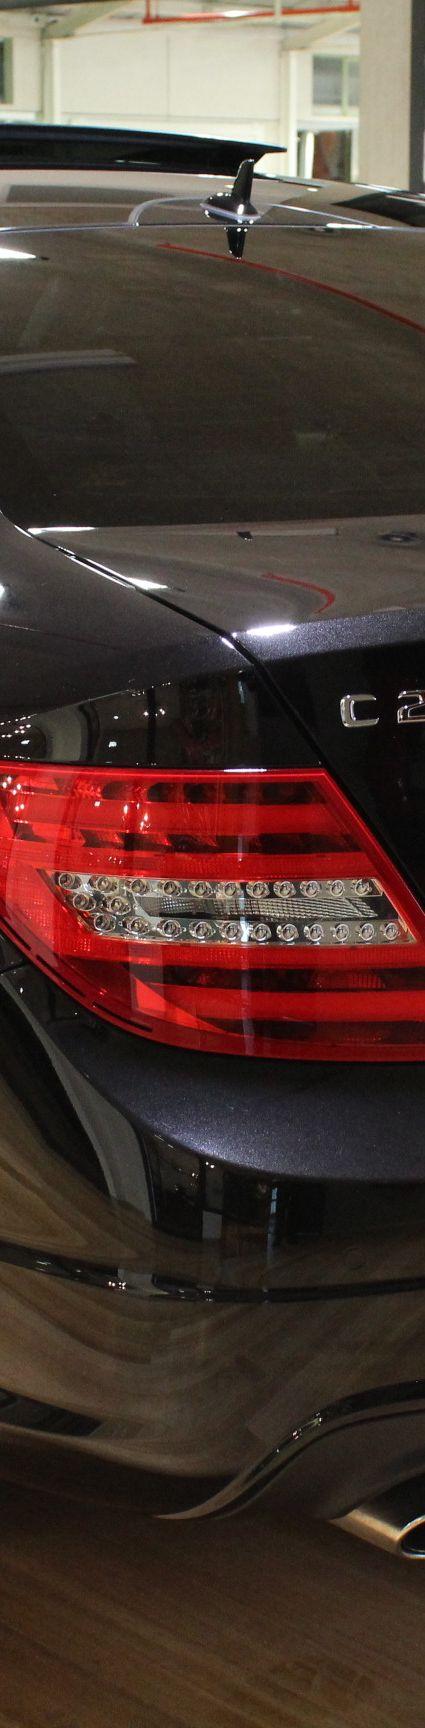 2015 Mercedes-Benz C250 C204 Avantgarde Coupe 2dr 7G-TRONIC + 7sp 1.8T - for sale in Australia